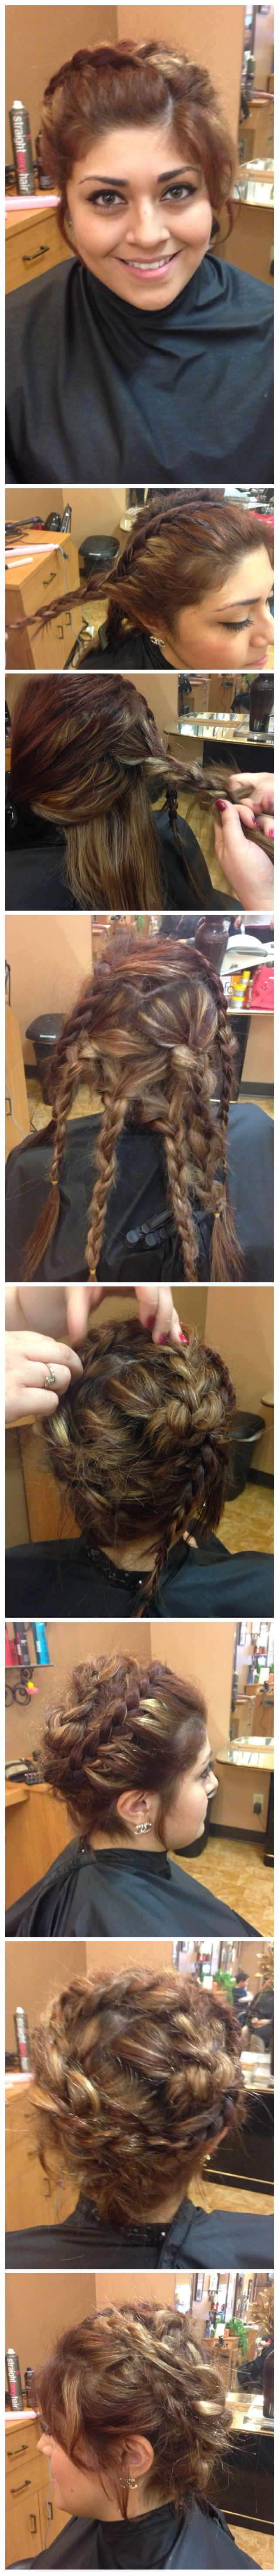 Rebecca_Pfeifer   #GOT #GameofThrones #festivalhair #hairtutorial #coachellahair #sexyhair #howto #DYI #Tutorial #Concerthair